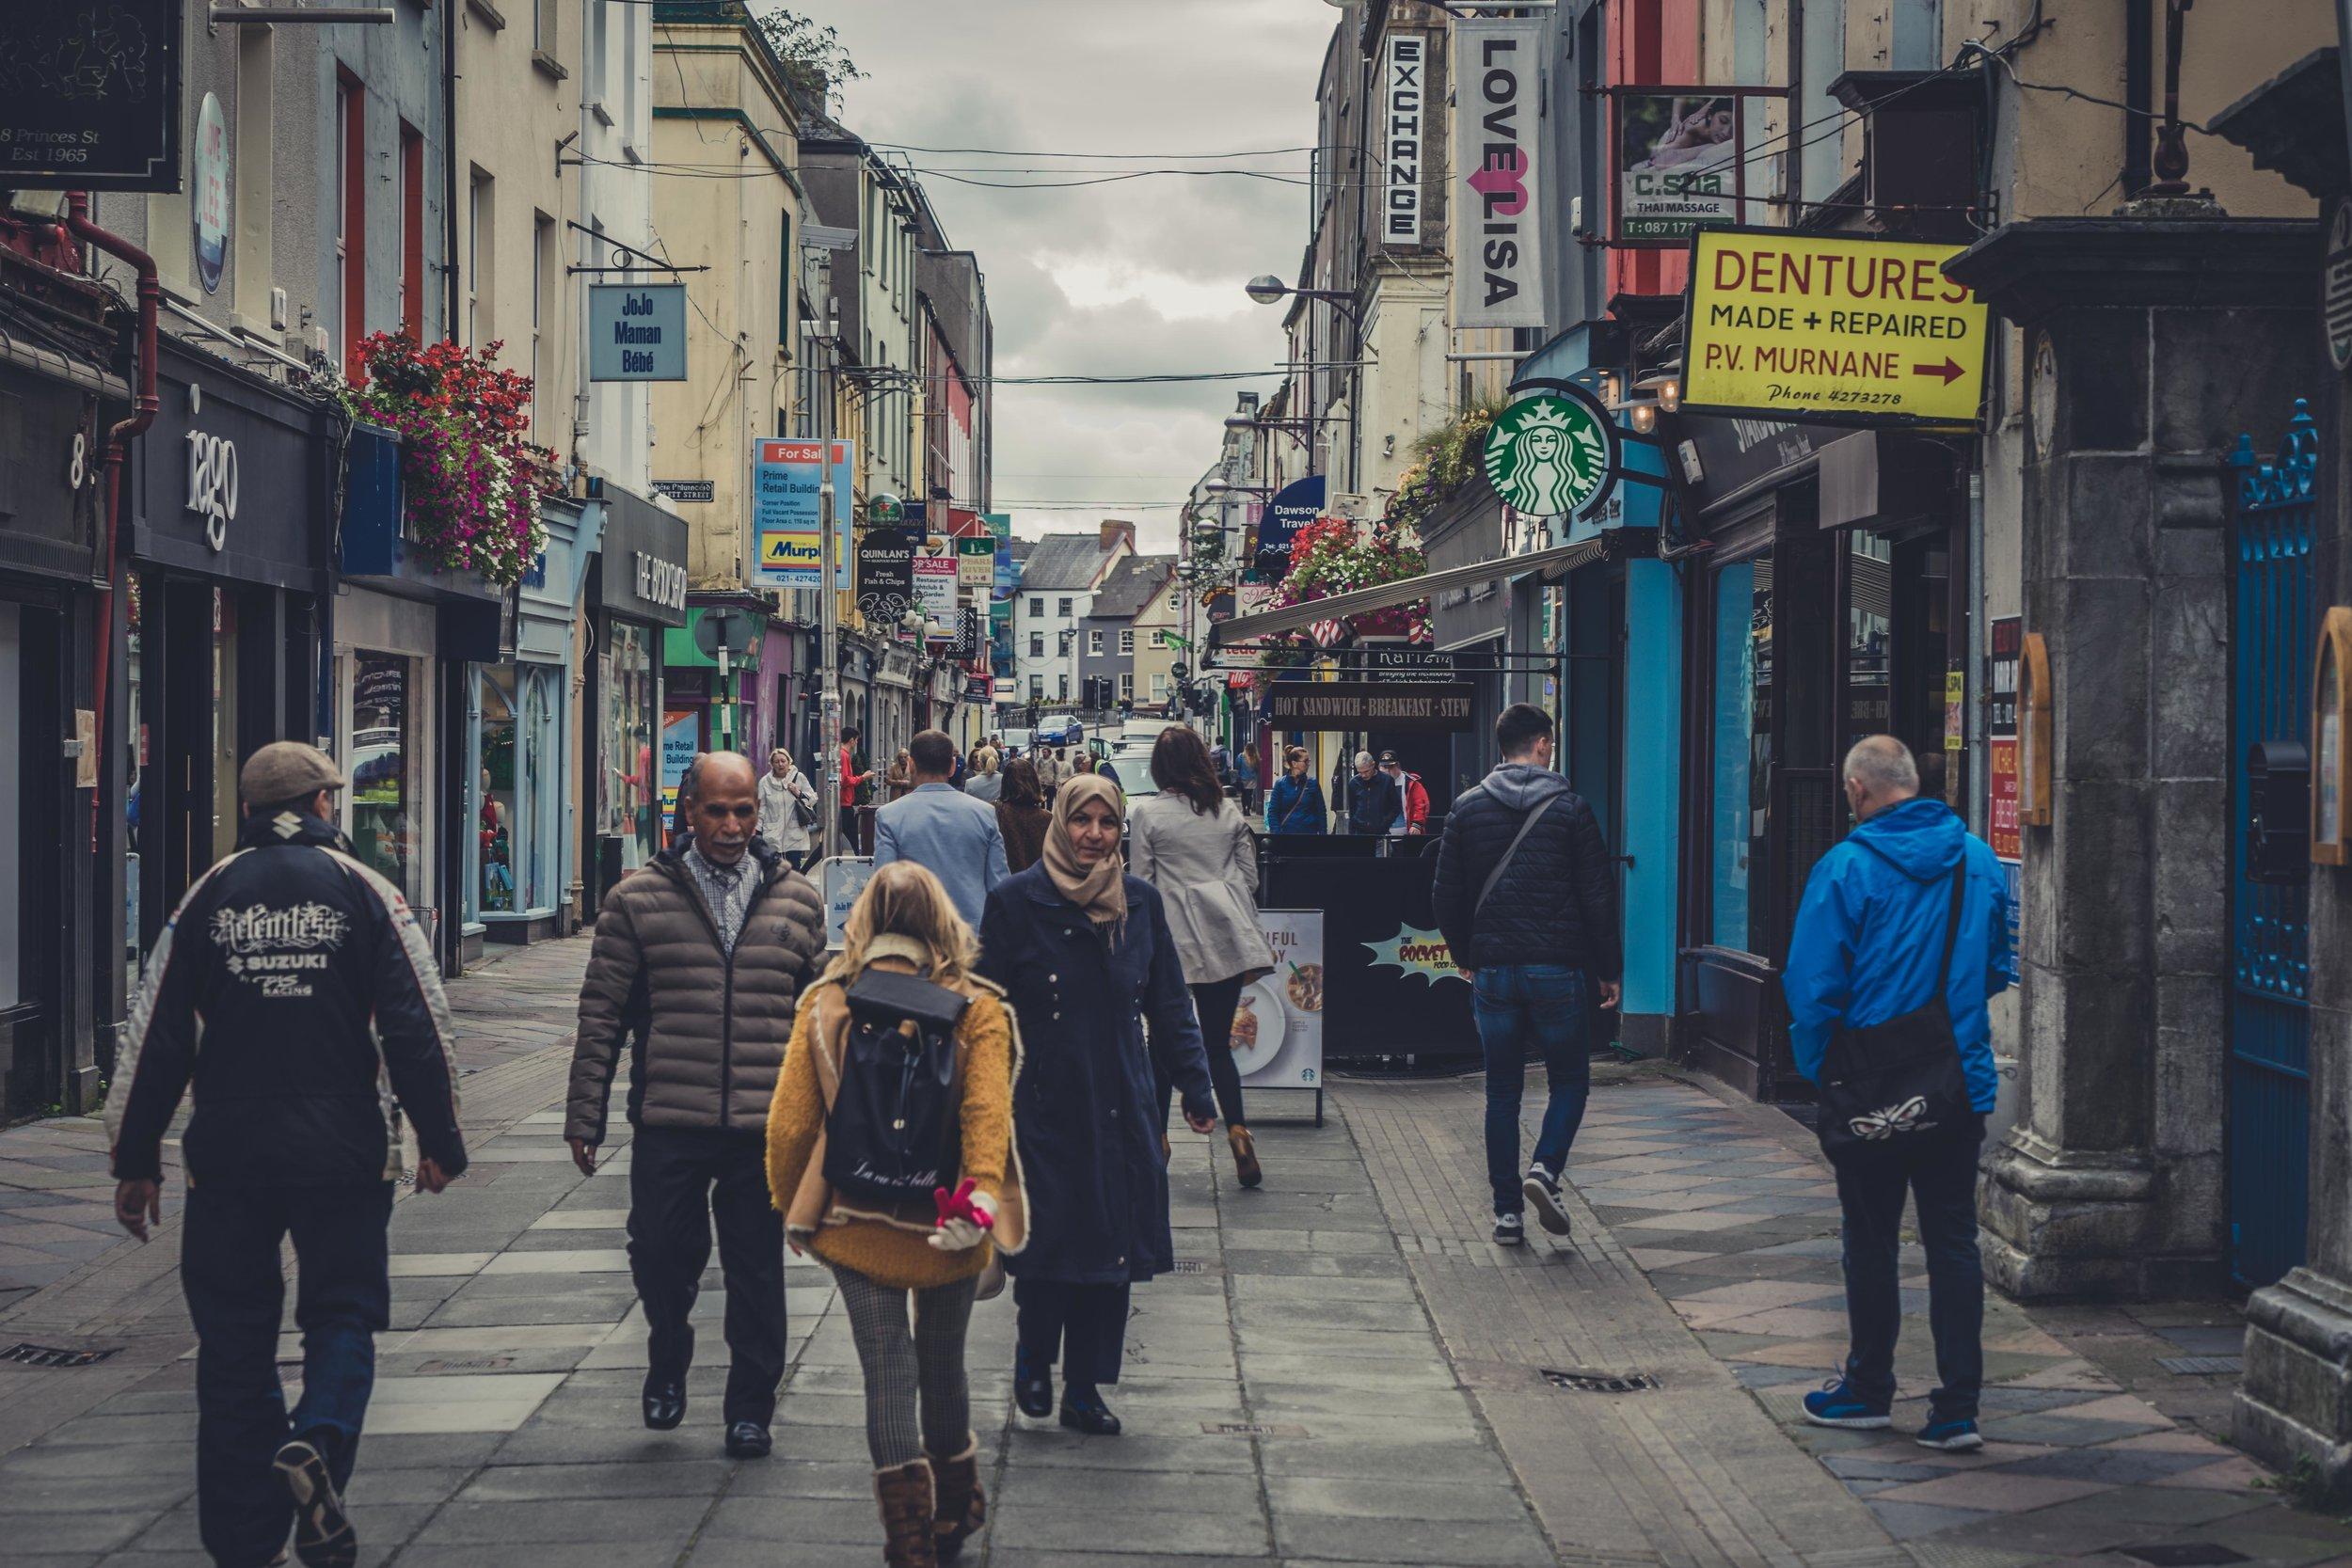 county cork. cork. ireland. irish. history. city. house sitting. old. travel. travel photography. travel photographer.  walking the city.jpg